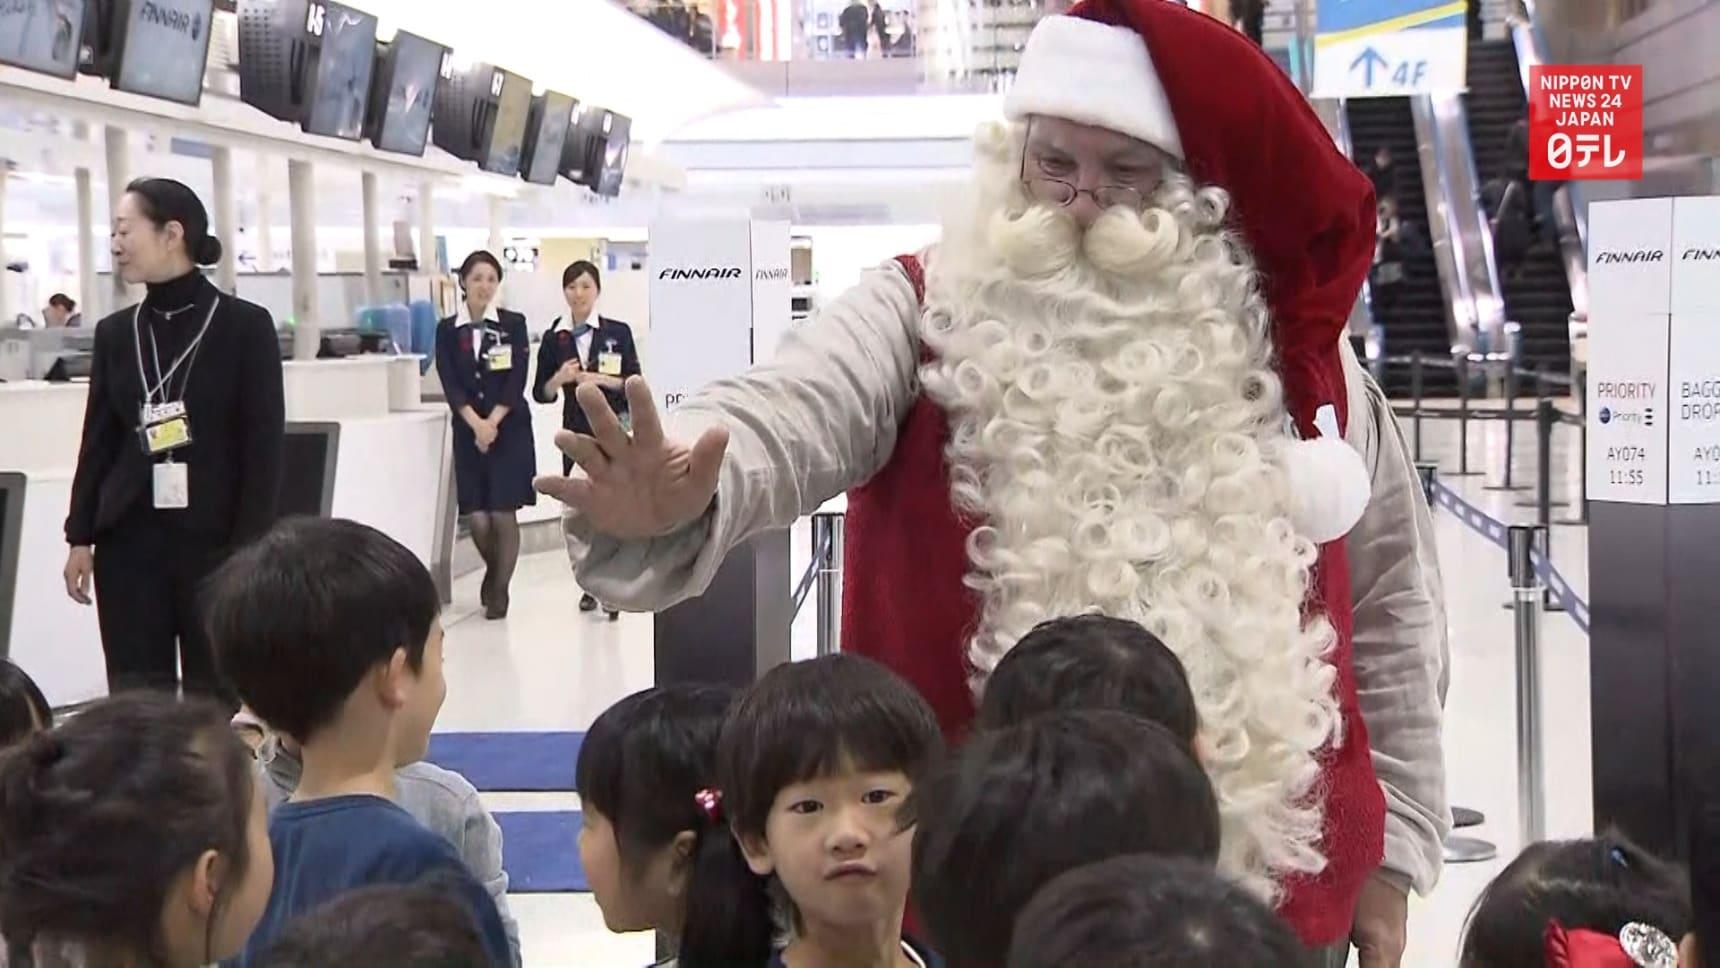 Santa Claus Comes to Japan